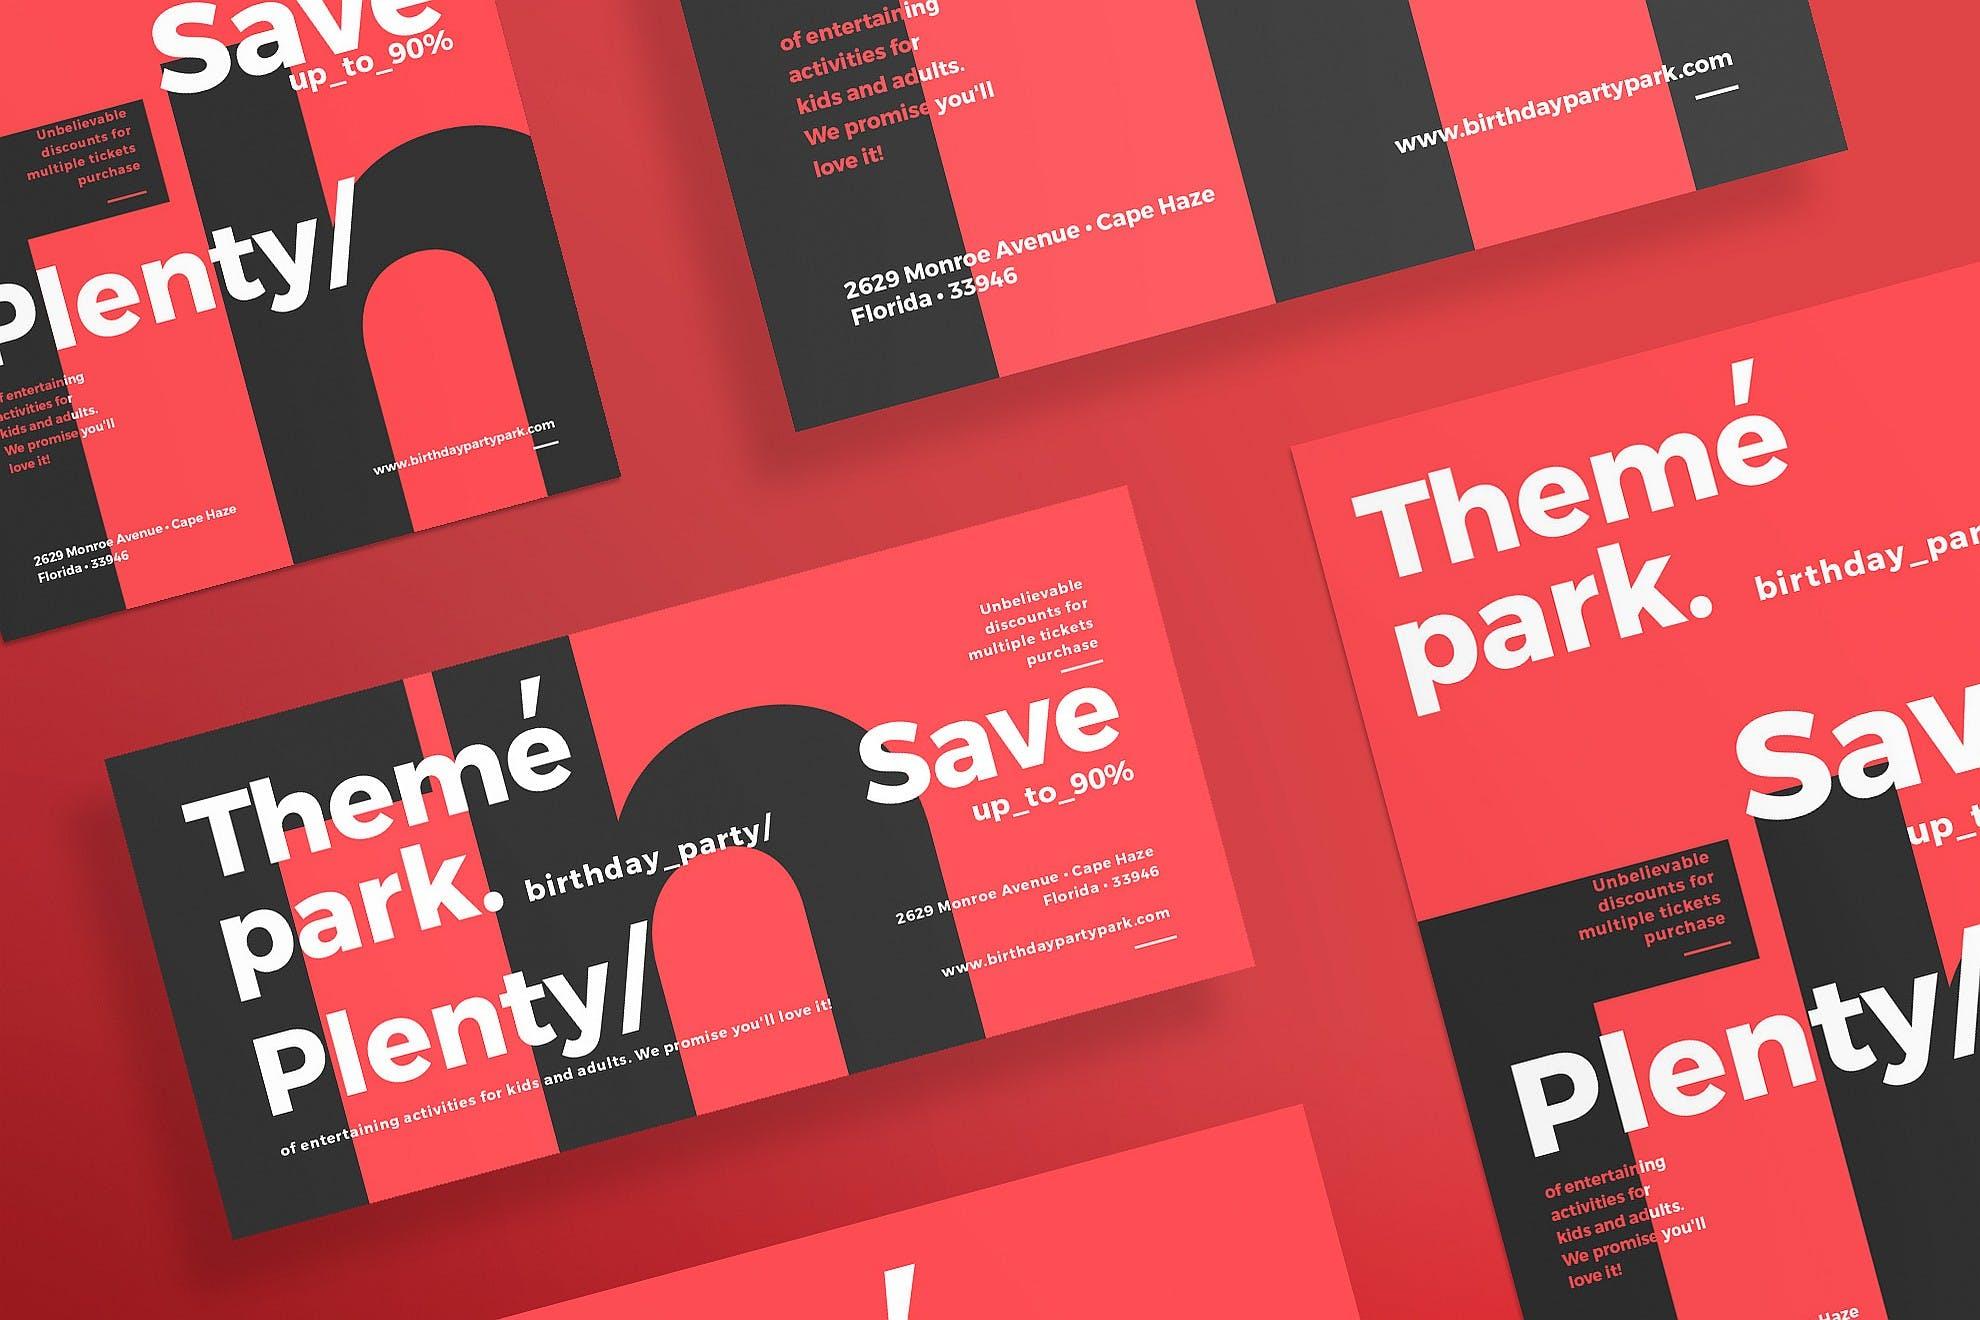 主题公园传单和海报模板Theme Park Flyer and Poster Template